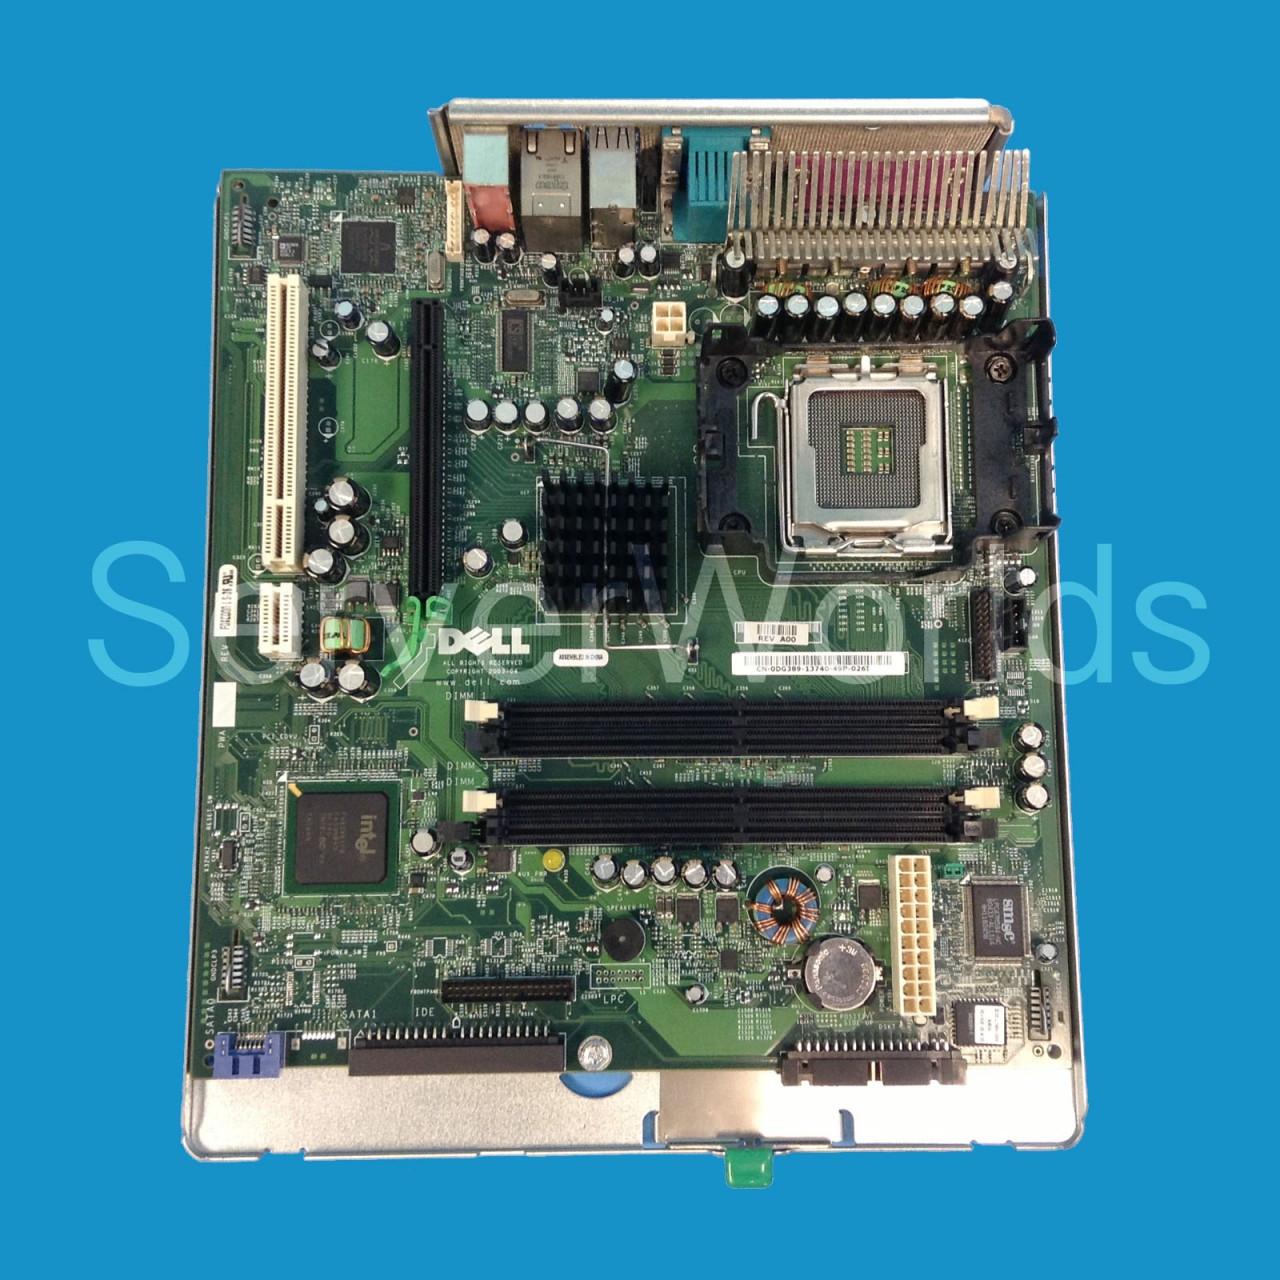 DELL OPTIPLEX GX280 VIDEO CARD DRIVER FOR WINDOWS 7